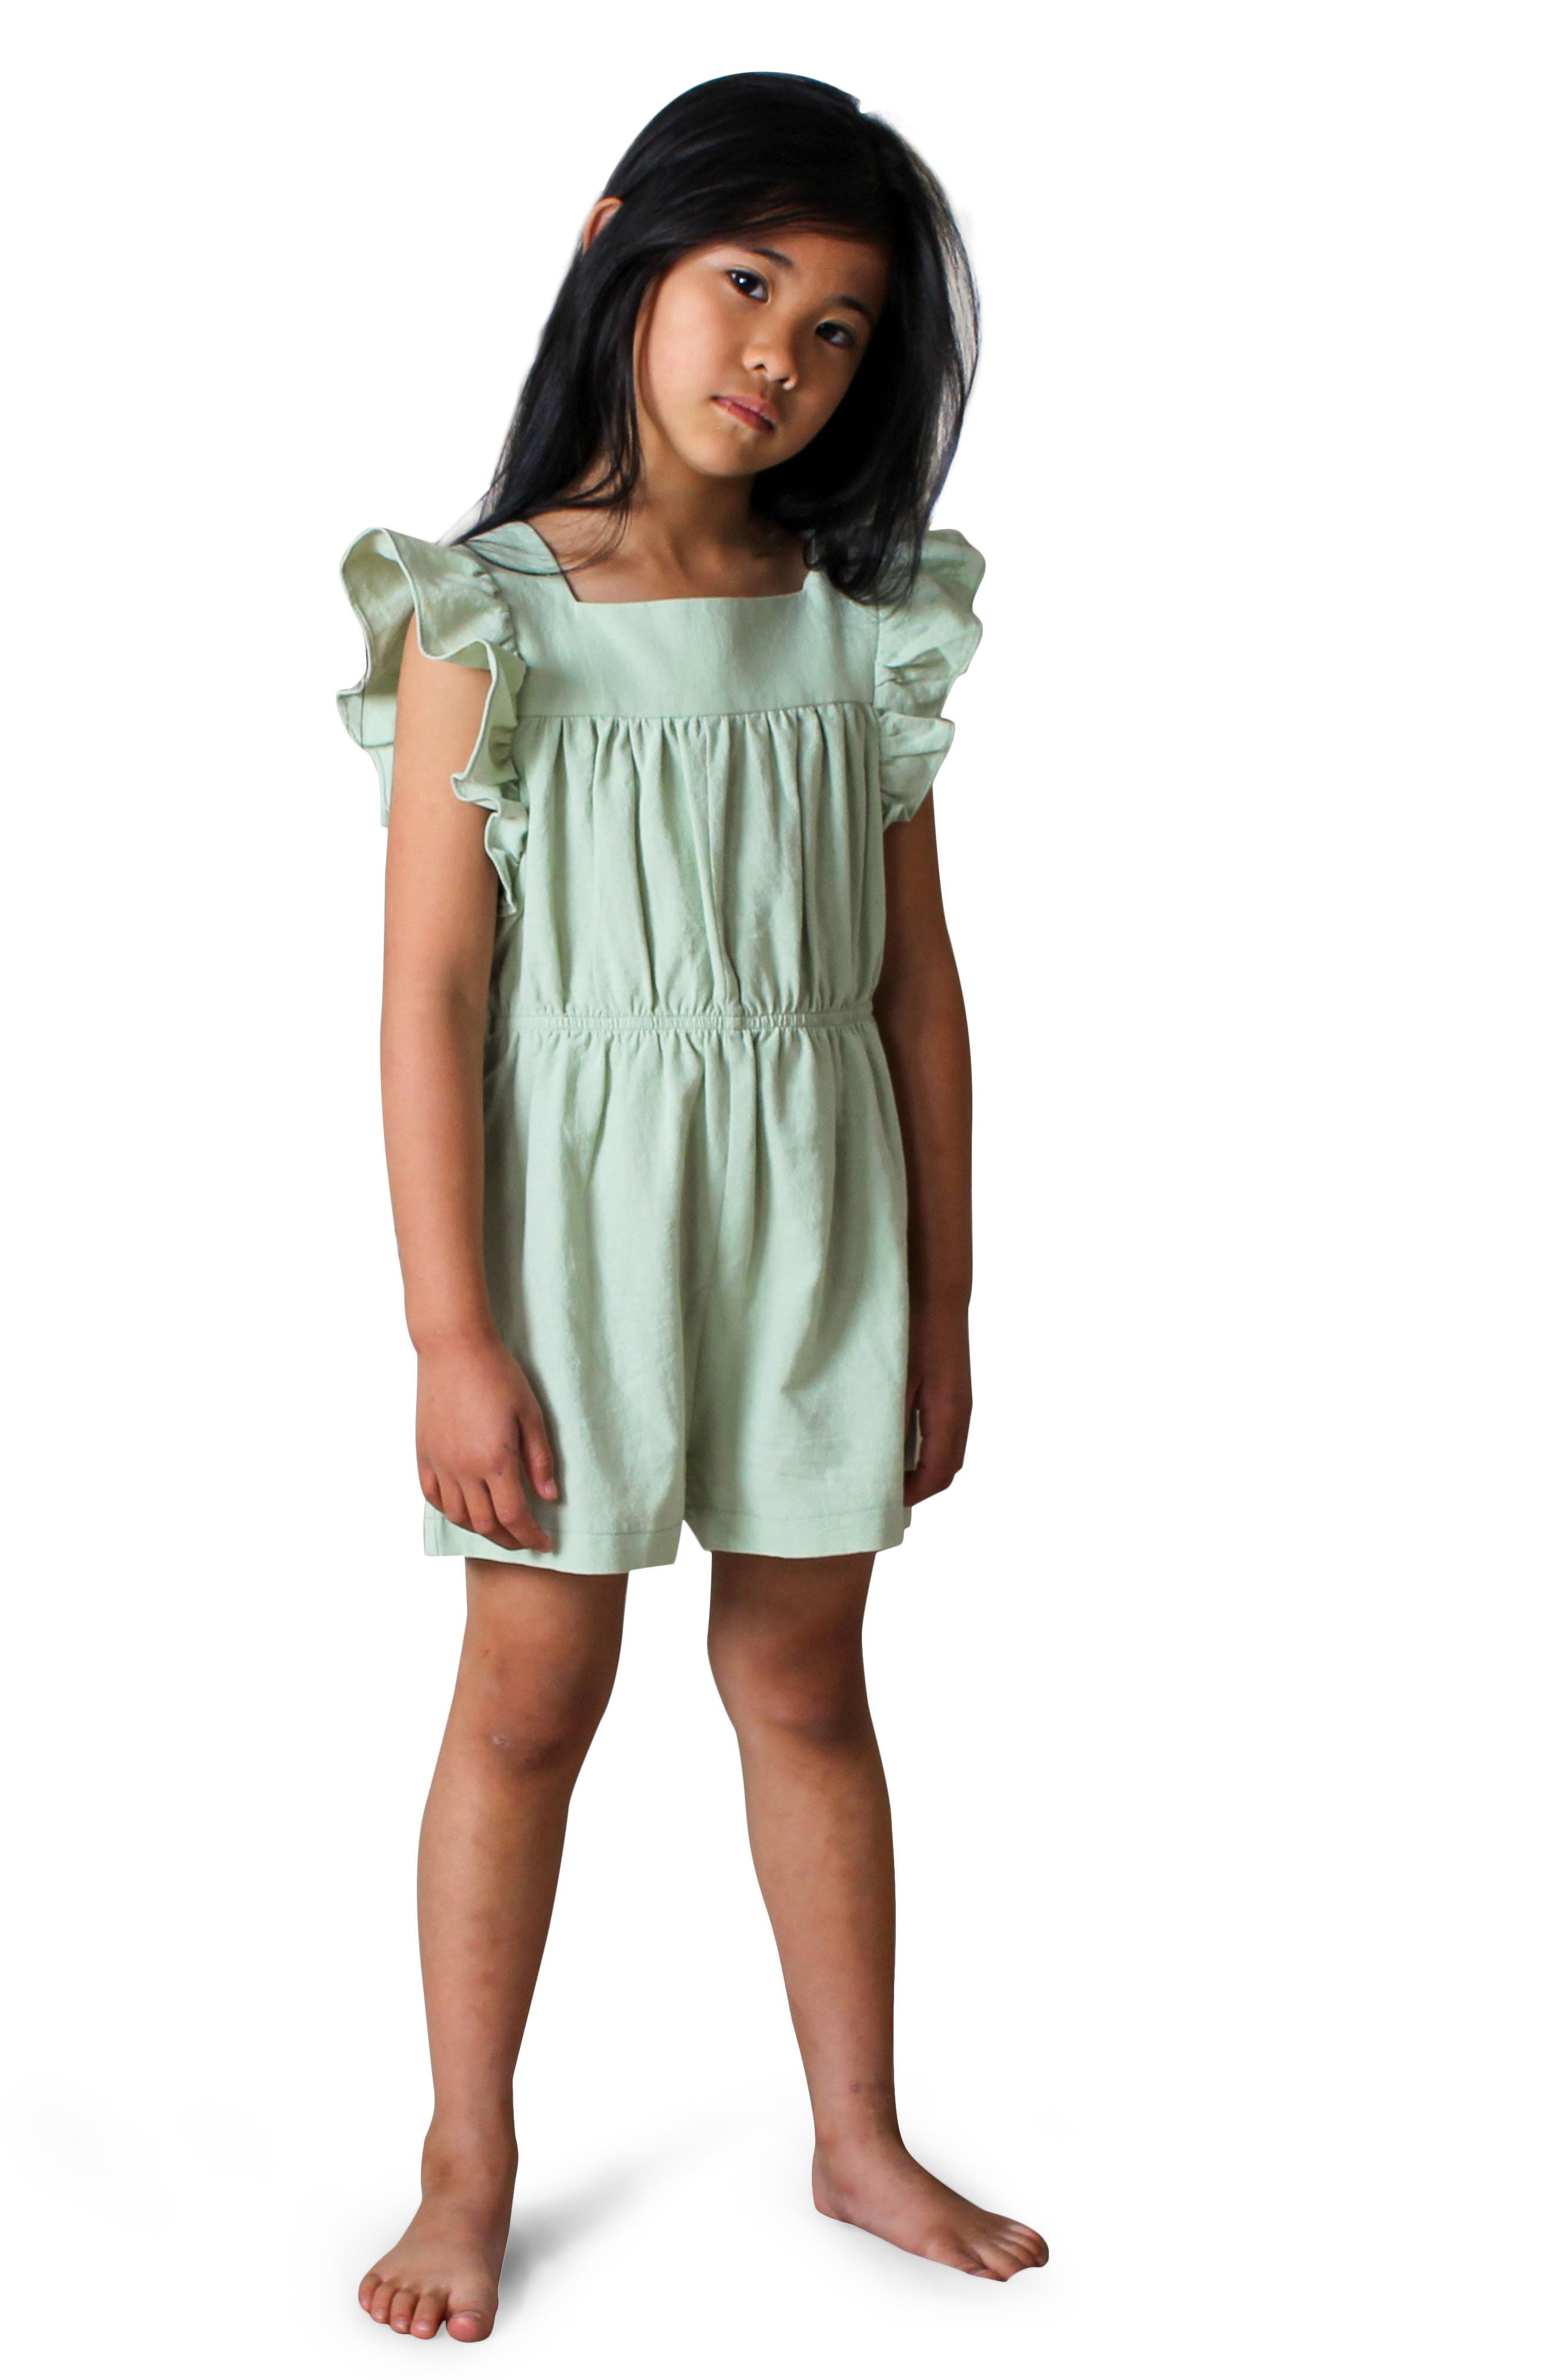 2T Crocheted Sleeveless Toddler Dress Grey Cream Green